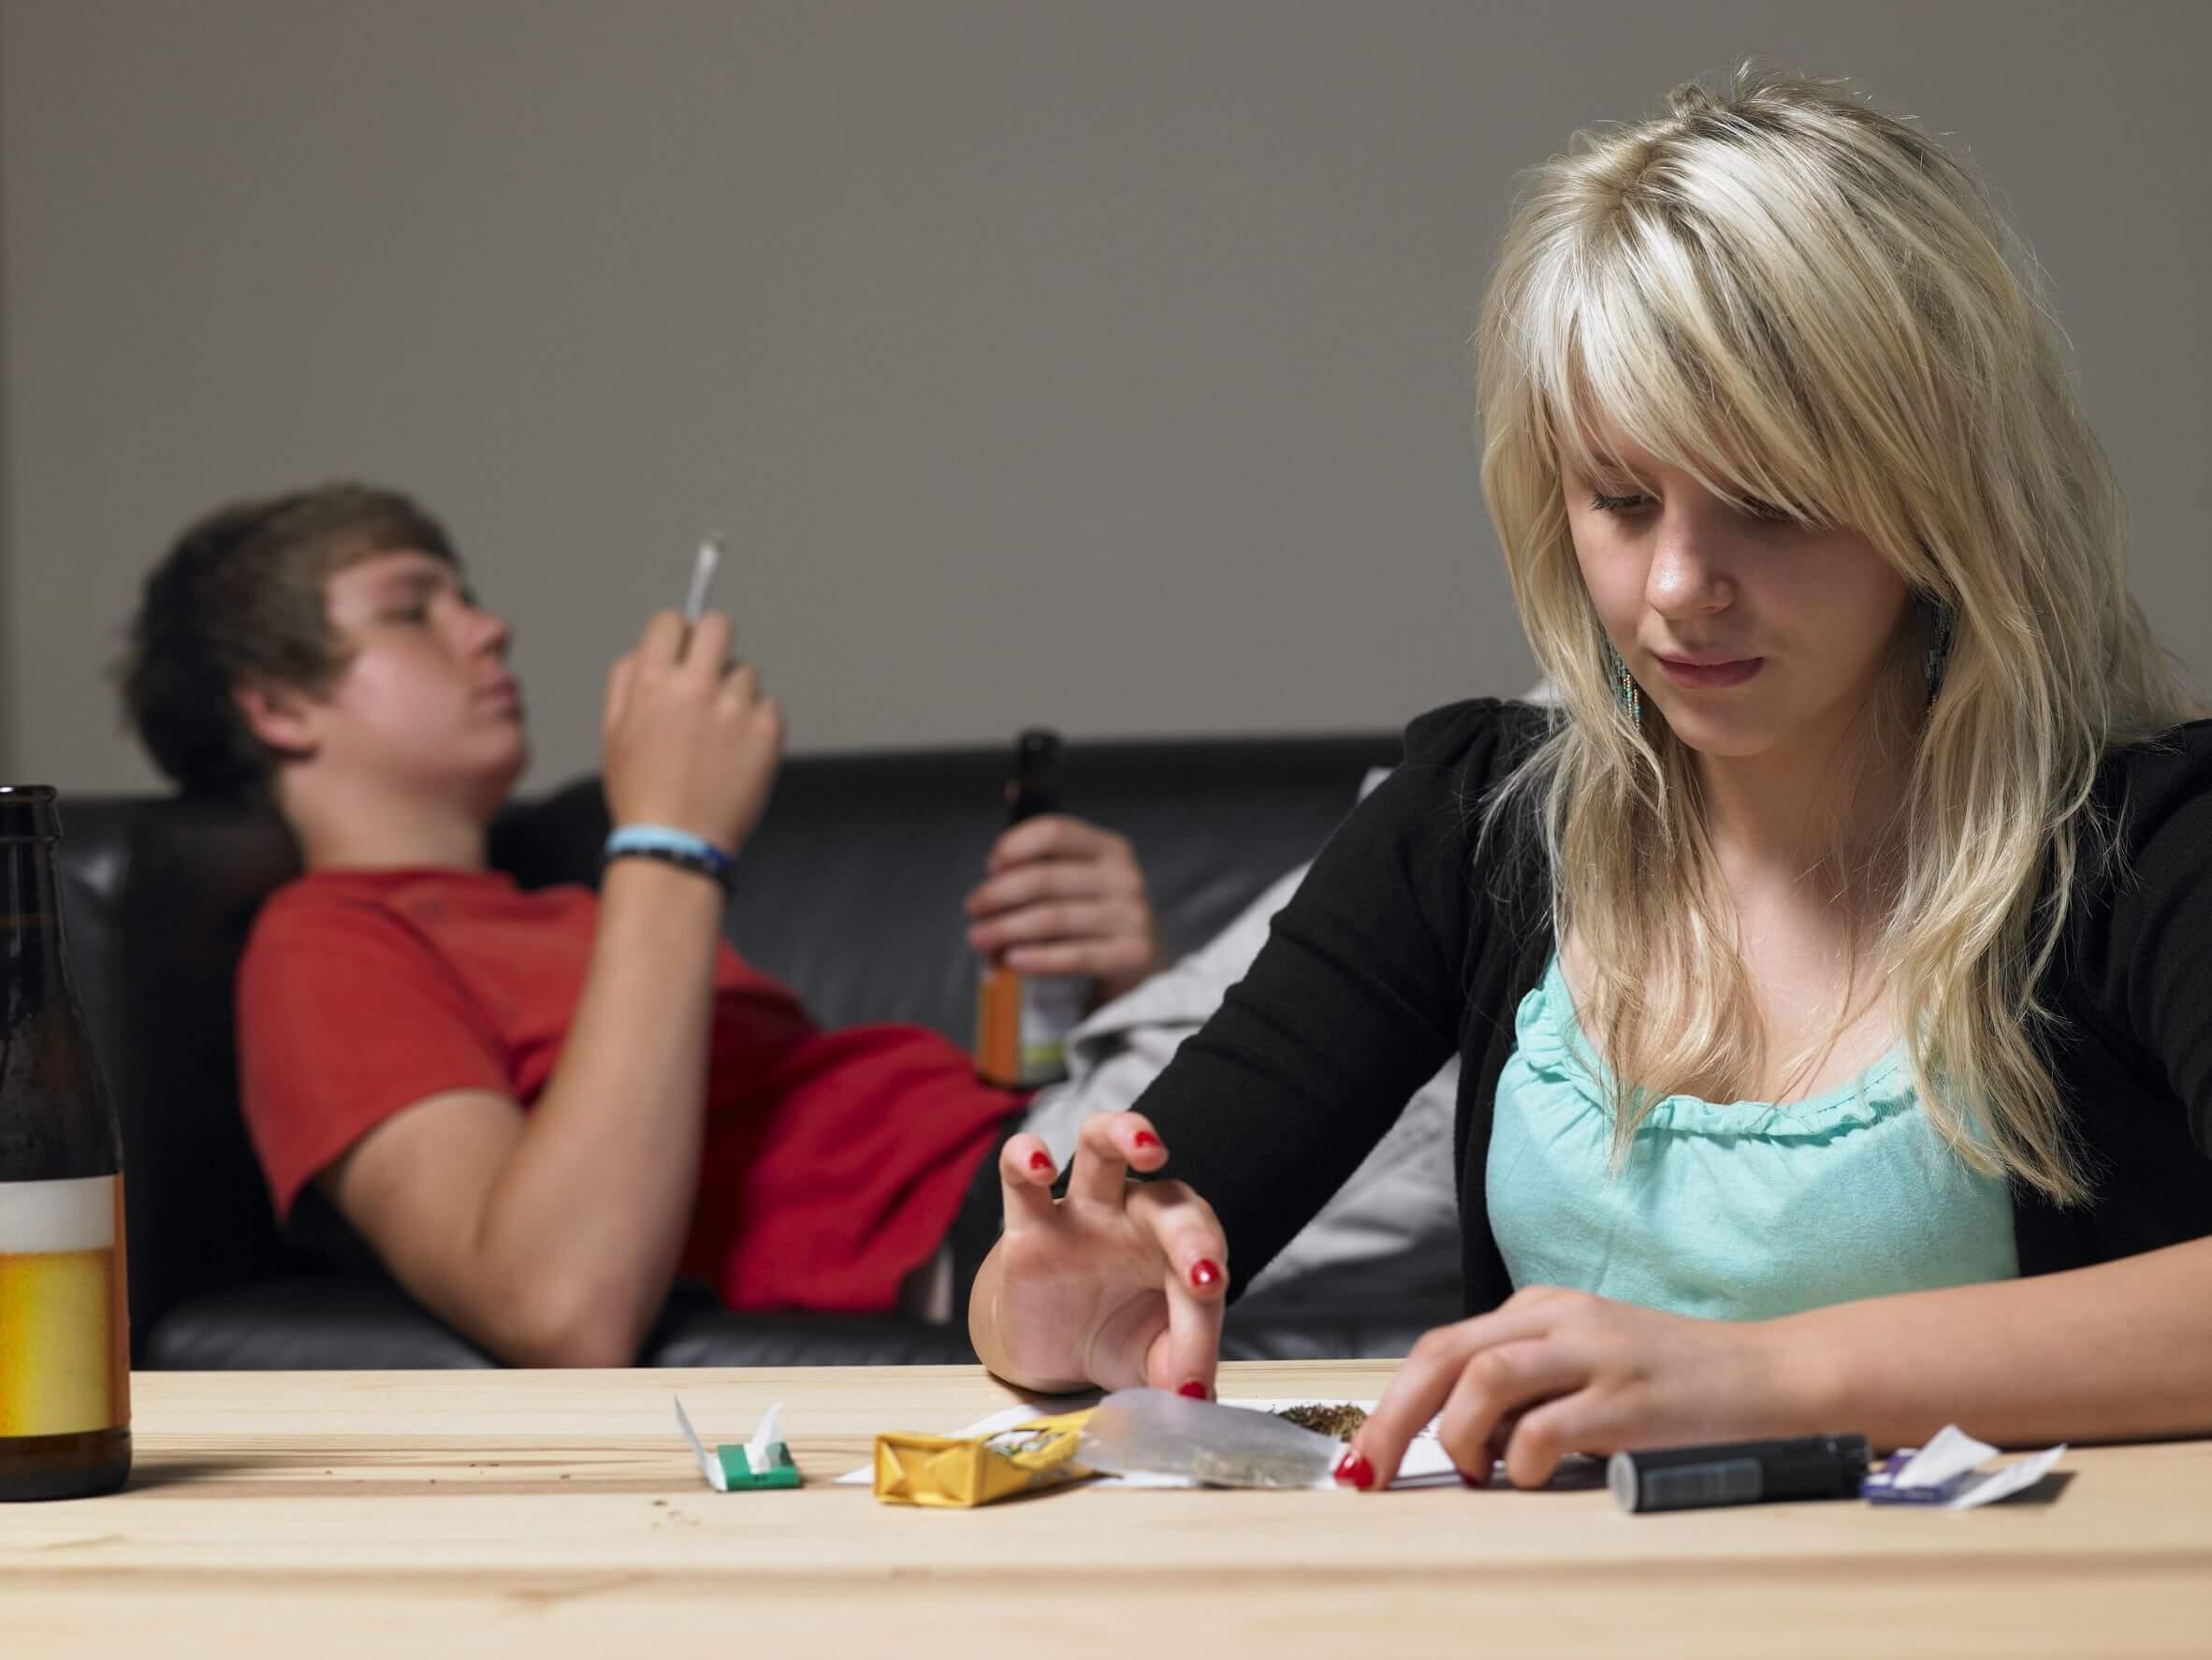 Adolescentes fumando porros.